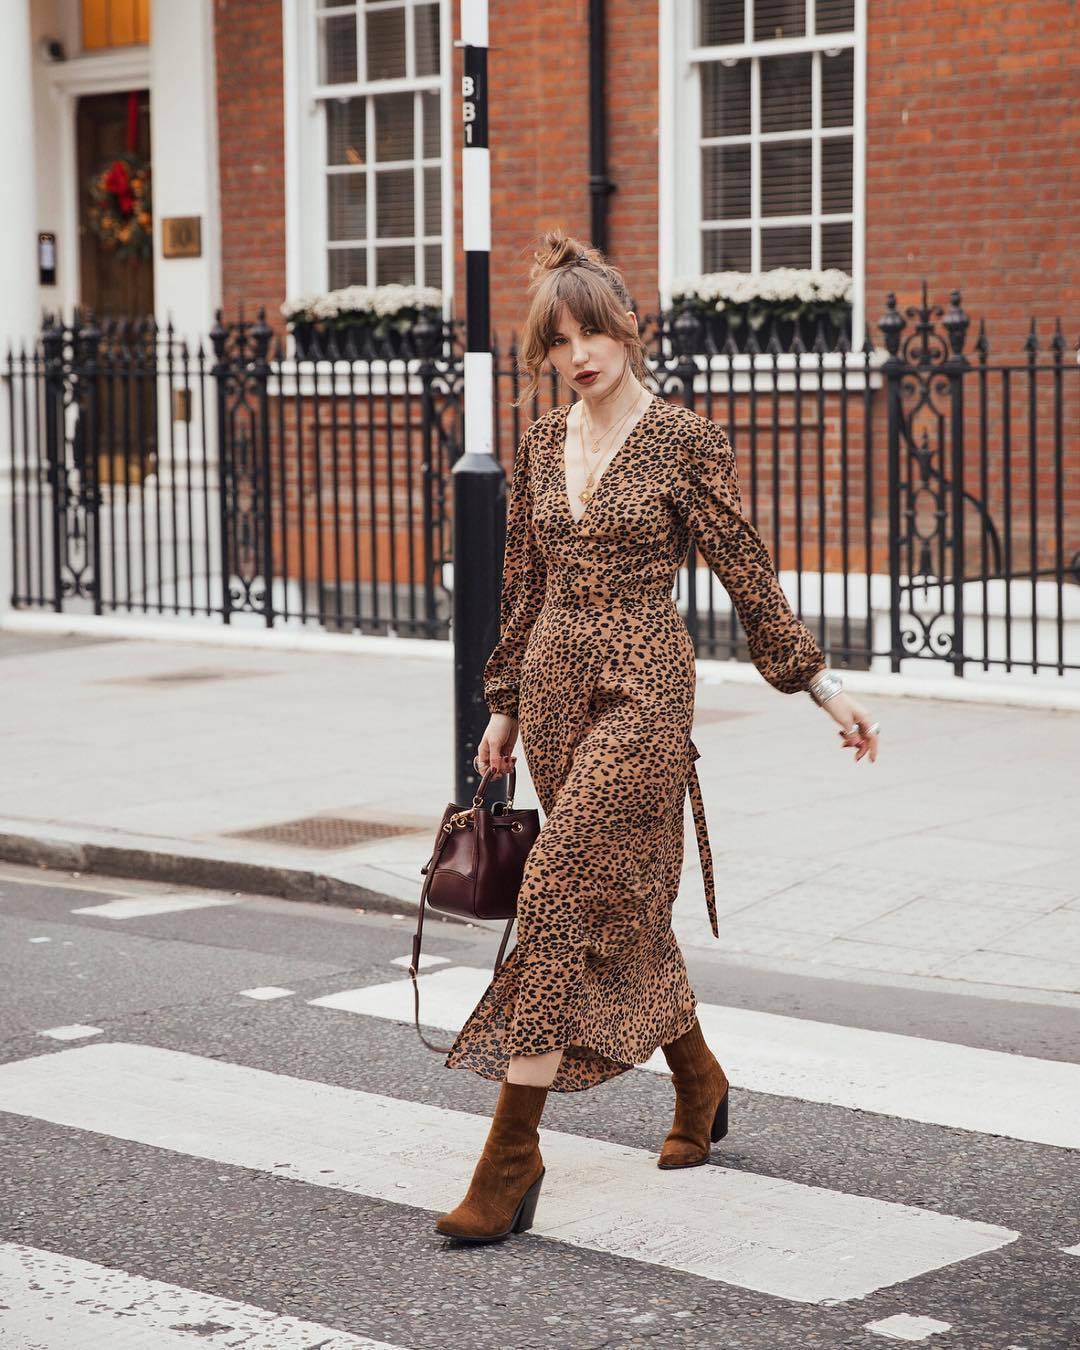 dress midi dress leopard print wrap dress brown boots heel boots brown bag crossbody bag